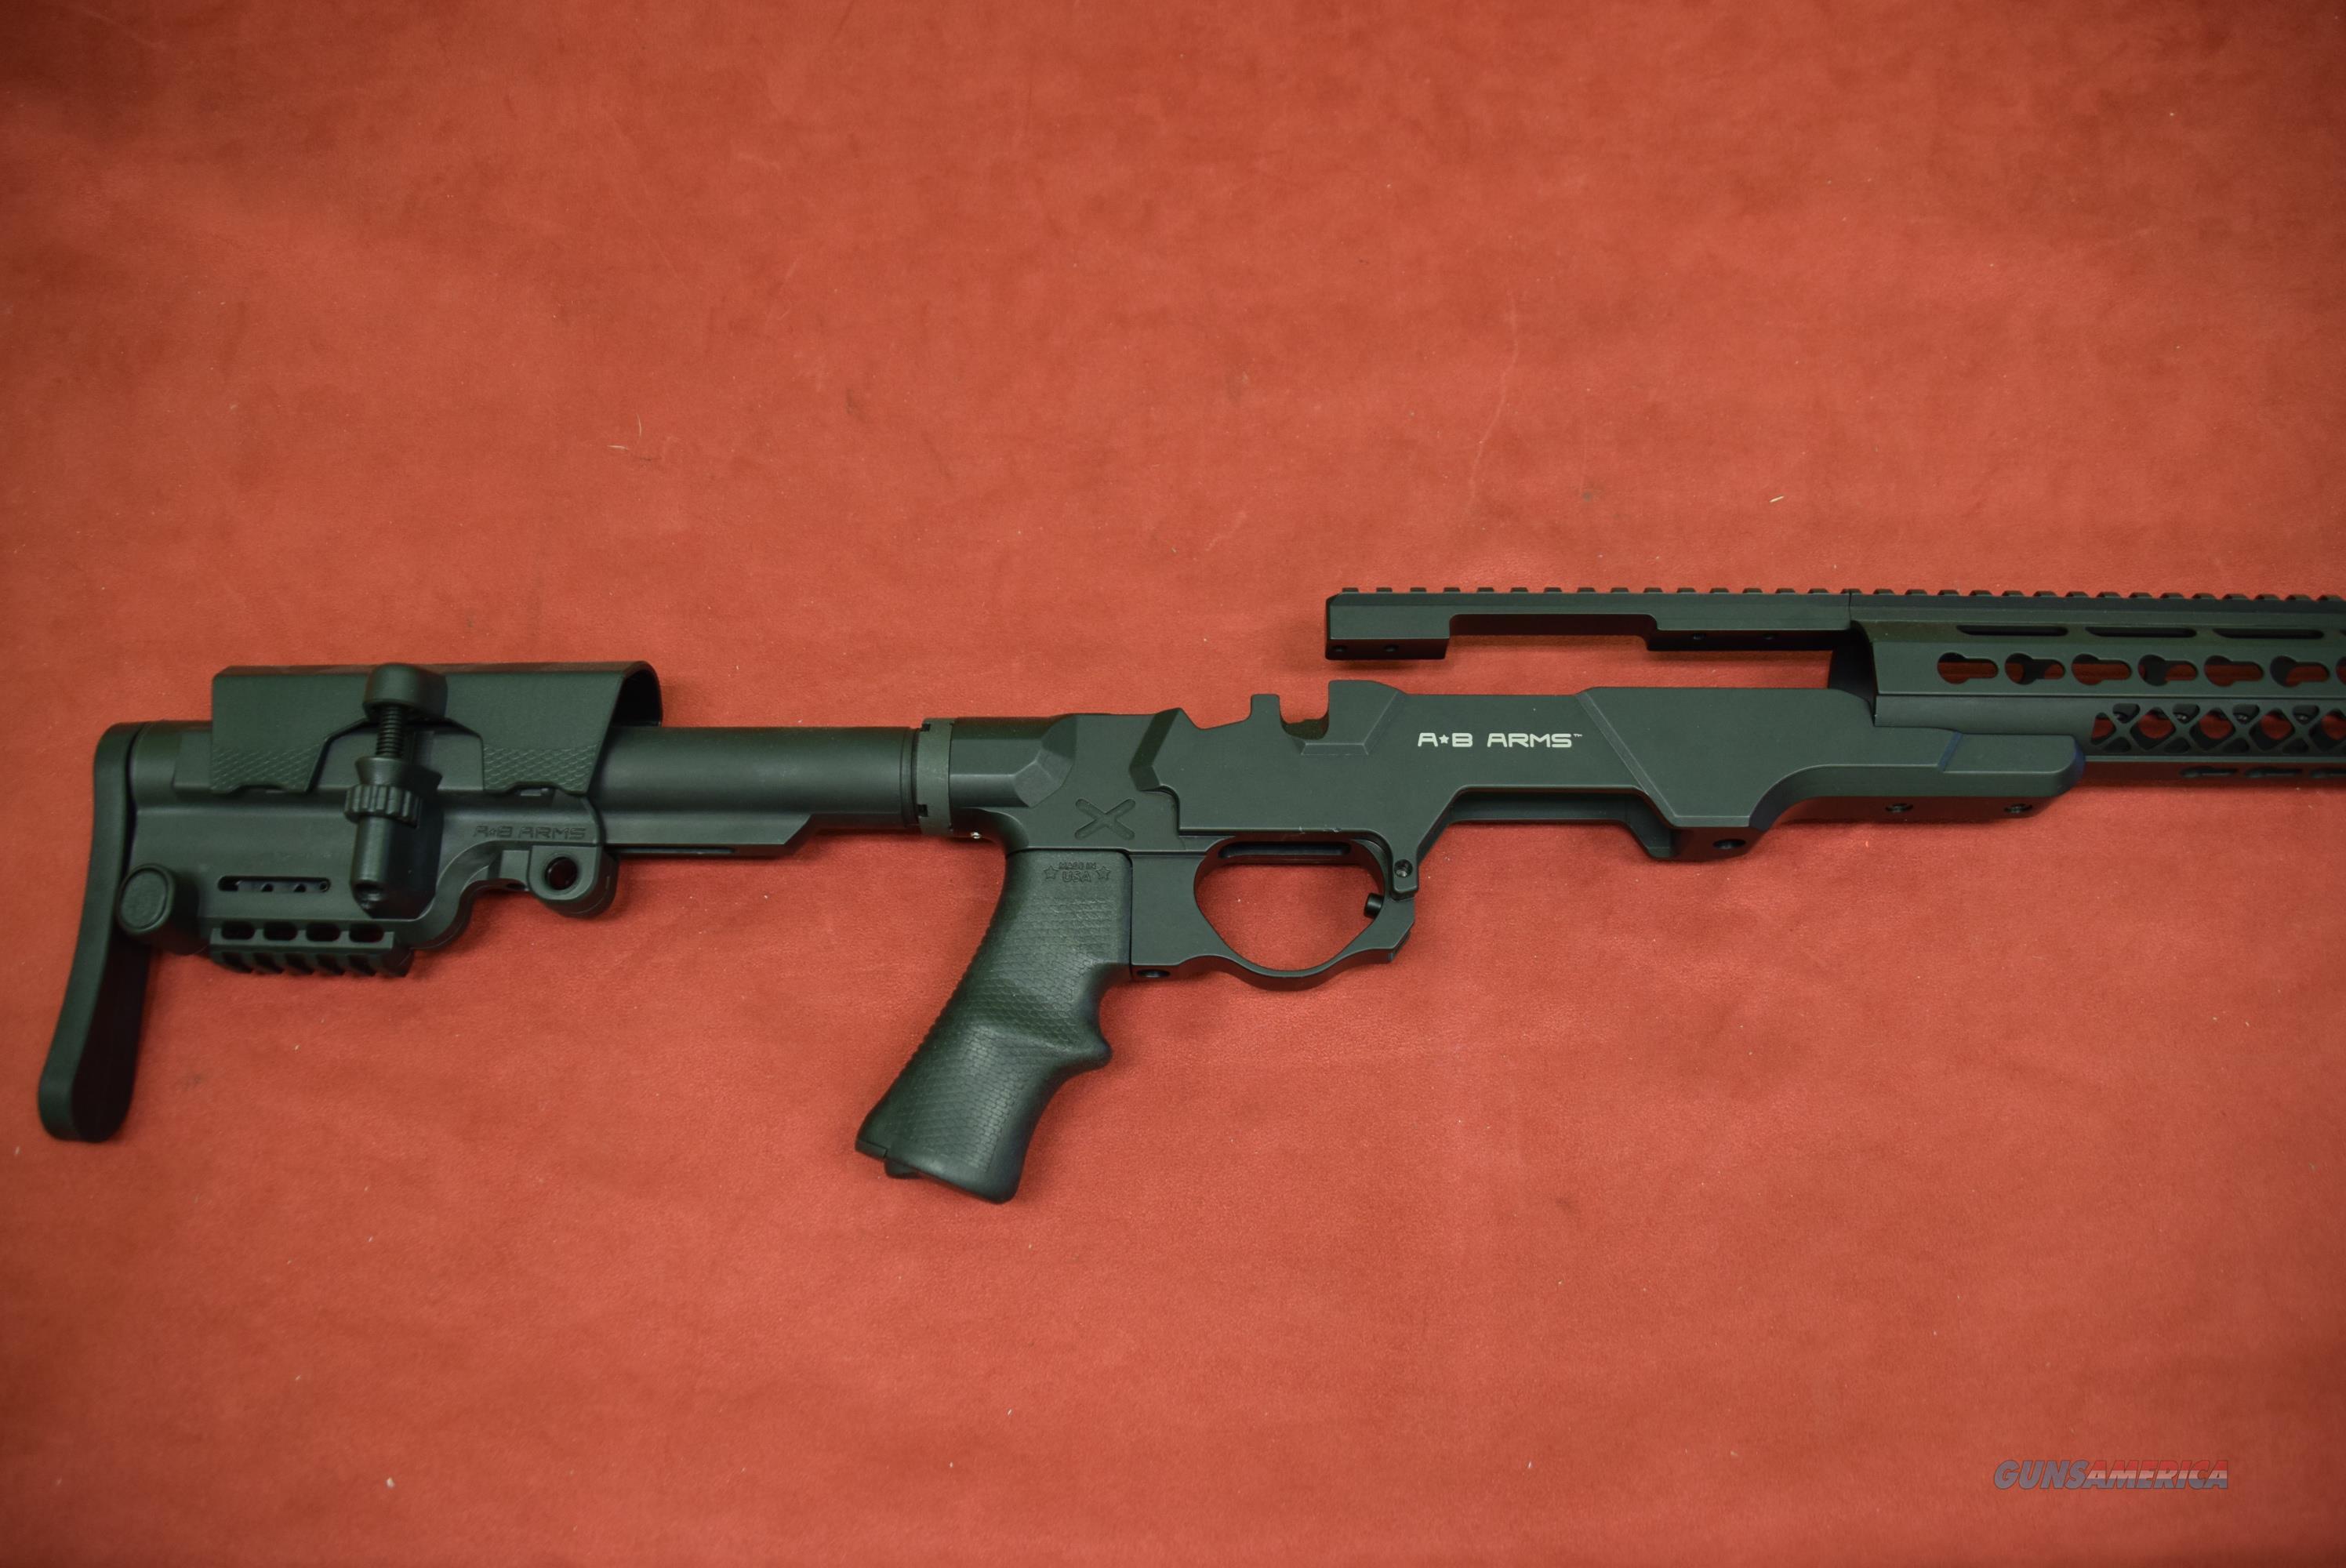 A.B. Arms Mod.X GenIII Modular Rifle System  Non-Guns > Gunstocks, Grips & Wood